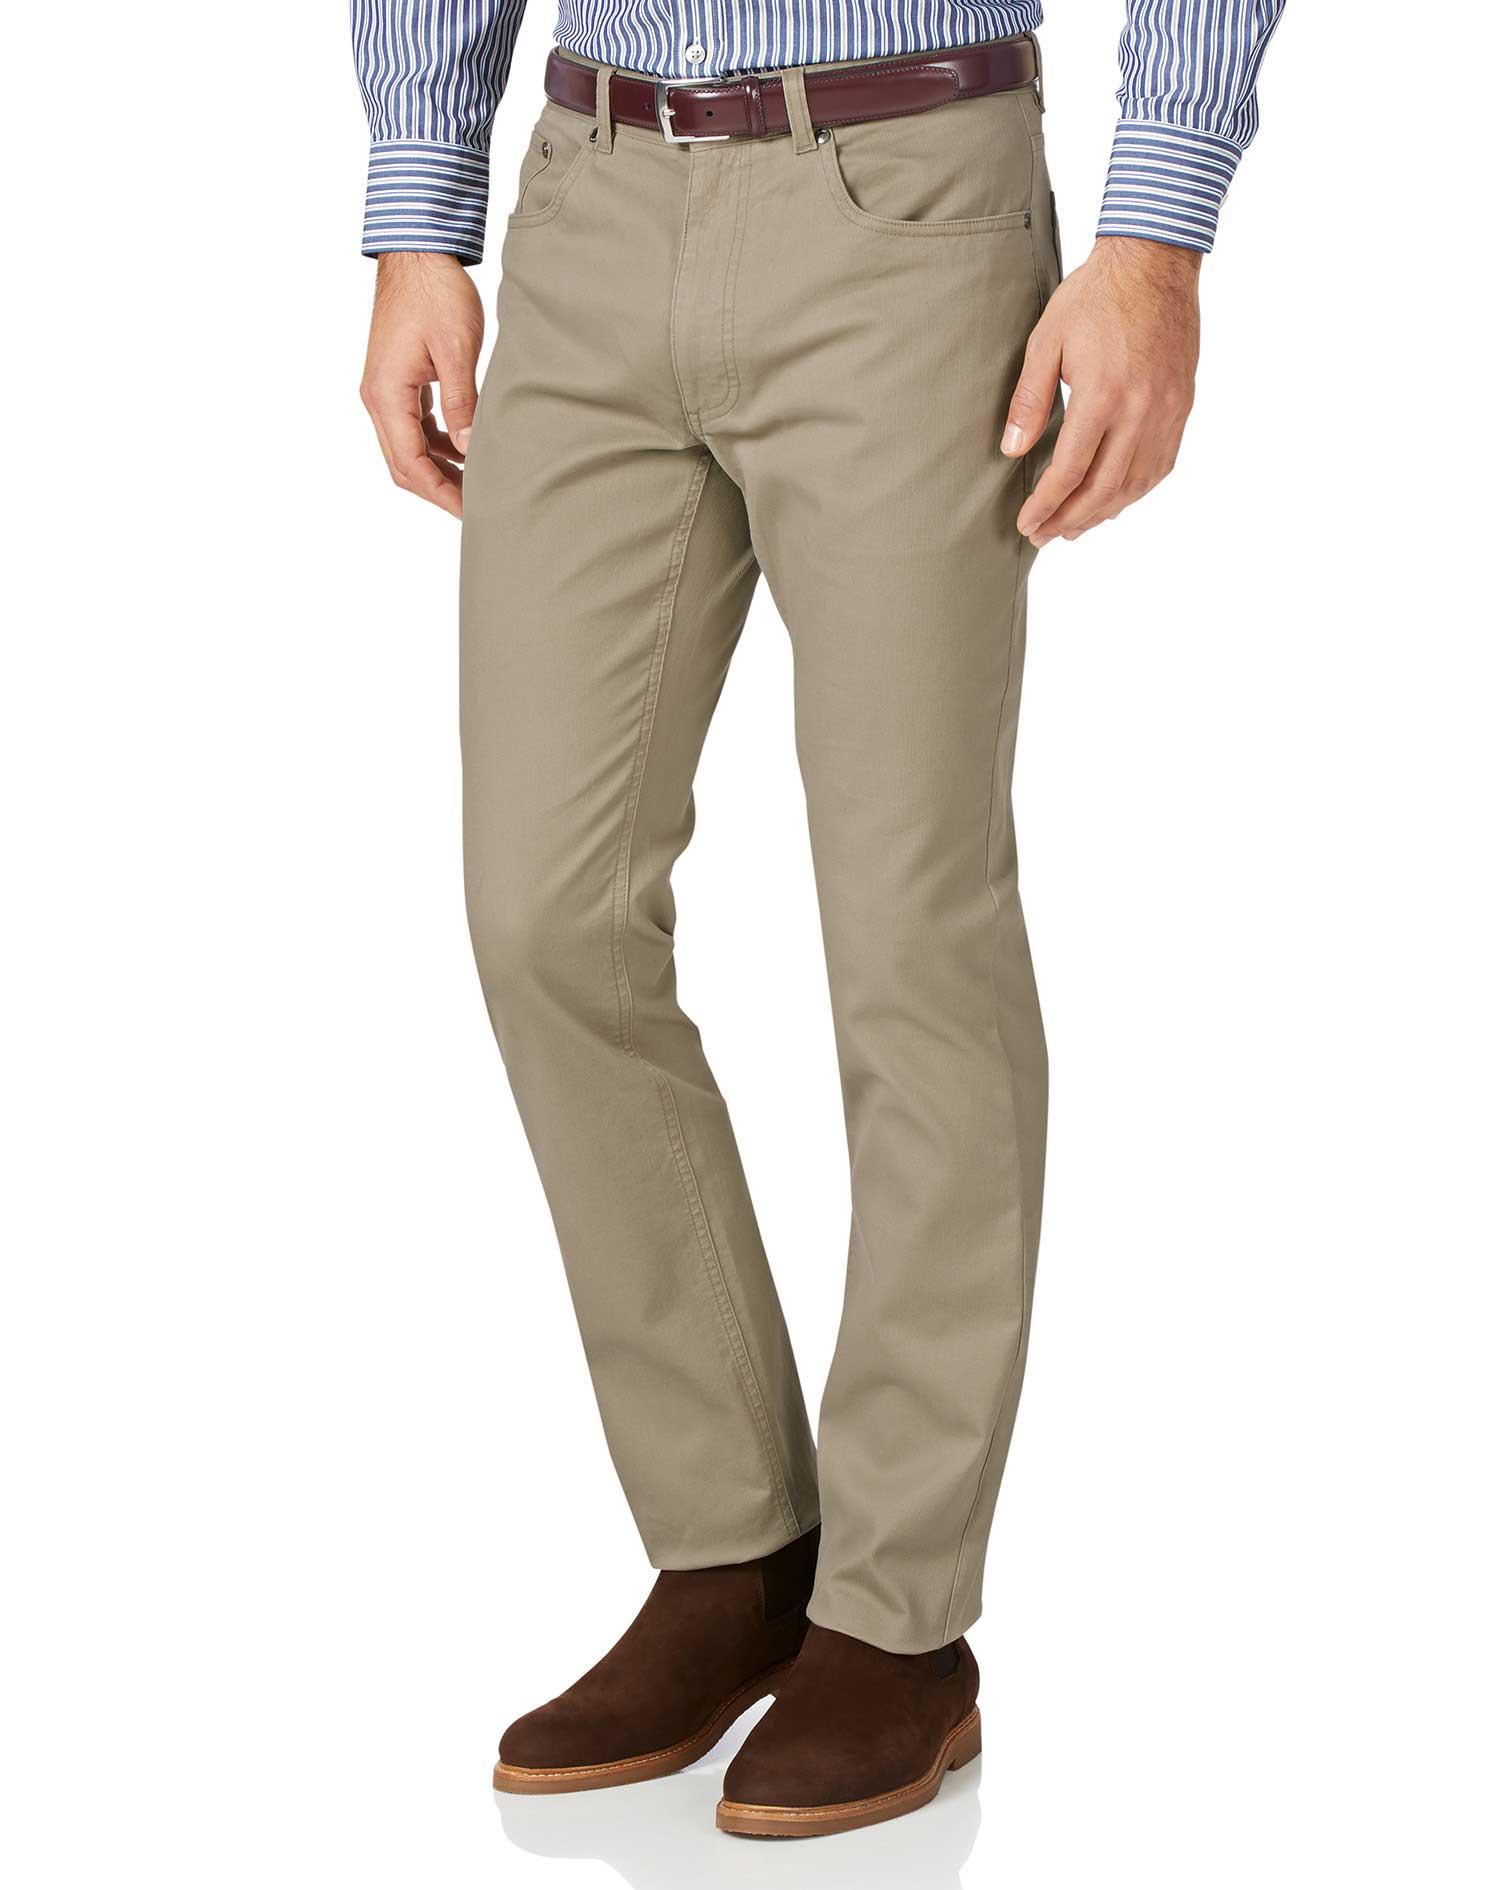 Stone Slim Fit Five Pocket Bedford Corduroy Trousers Size W30 L34 by Charles Tyrwhitt